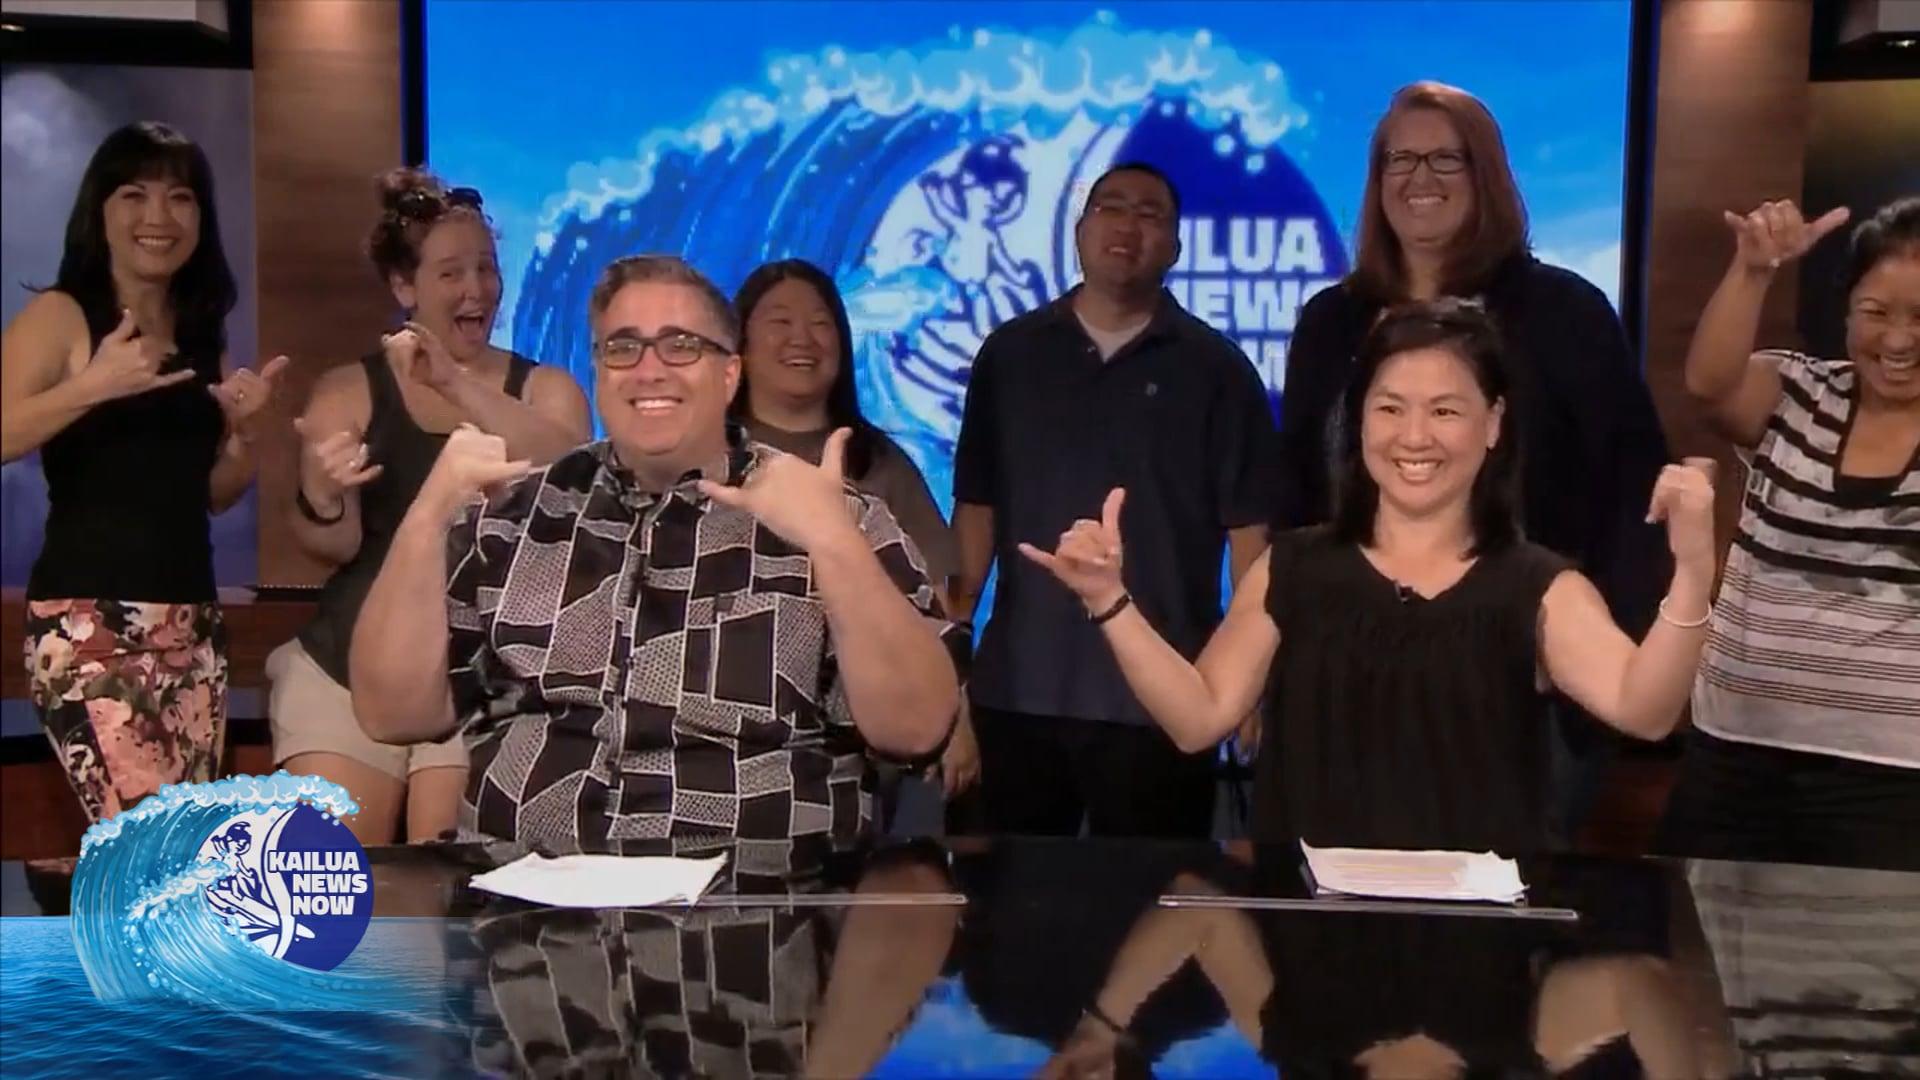 ILT Video - Kailua News Now